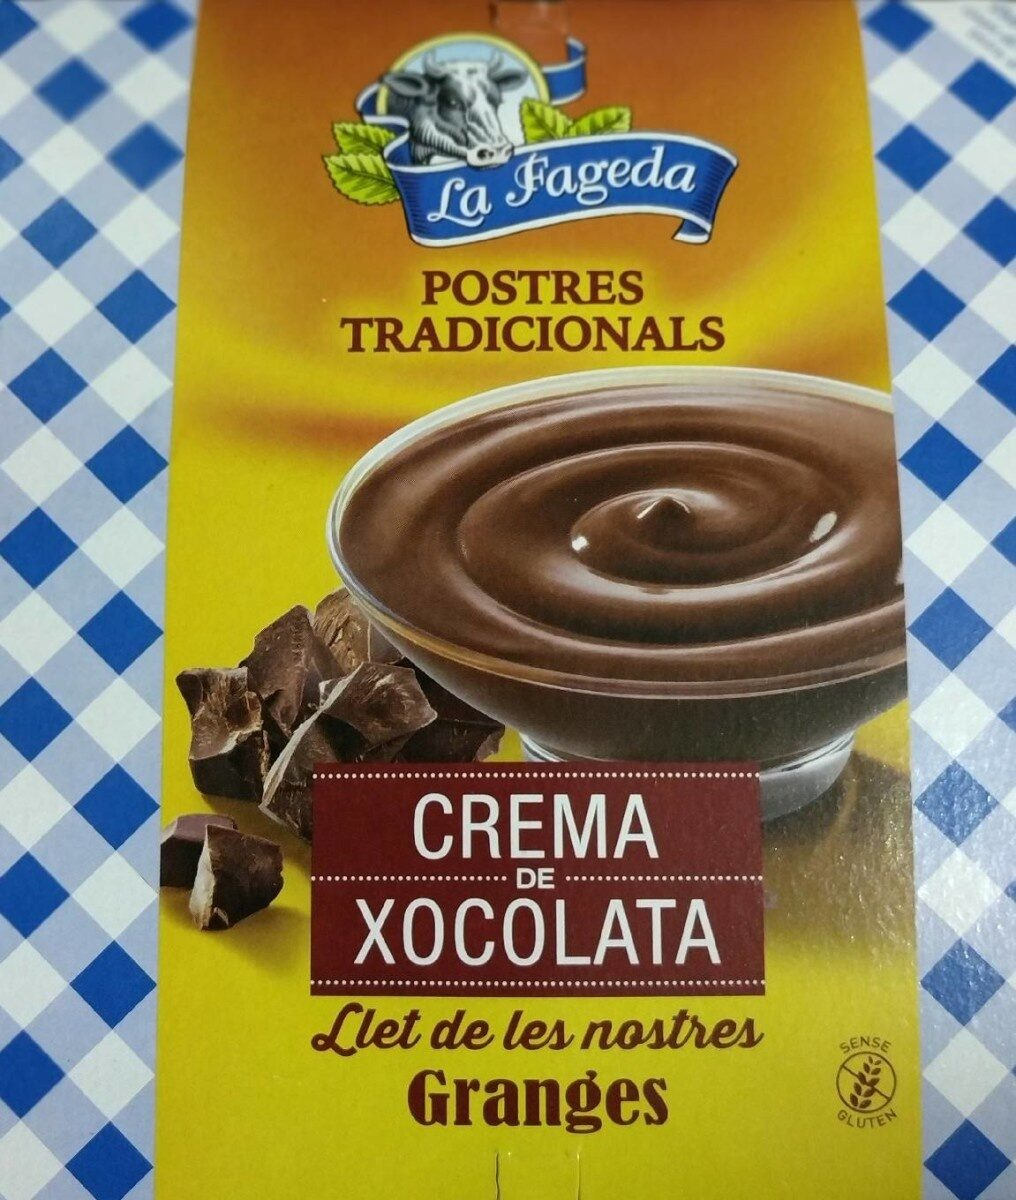 Crema de chocolate - Product